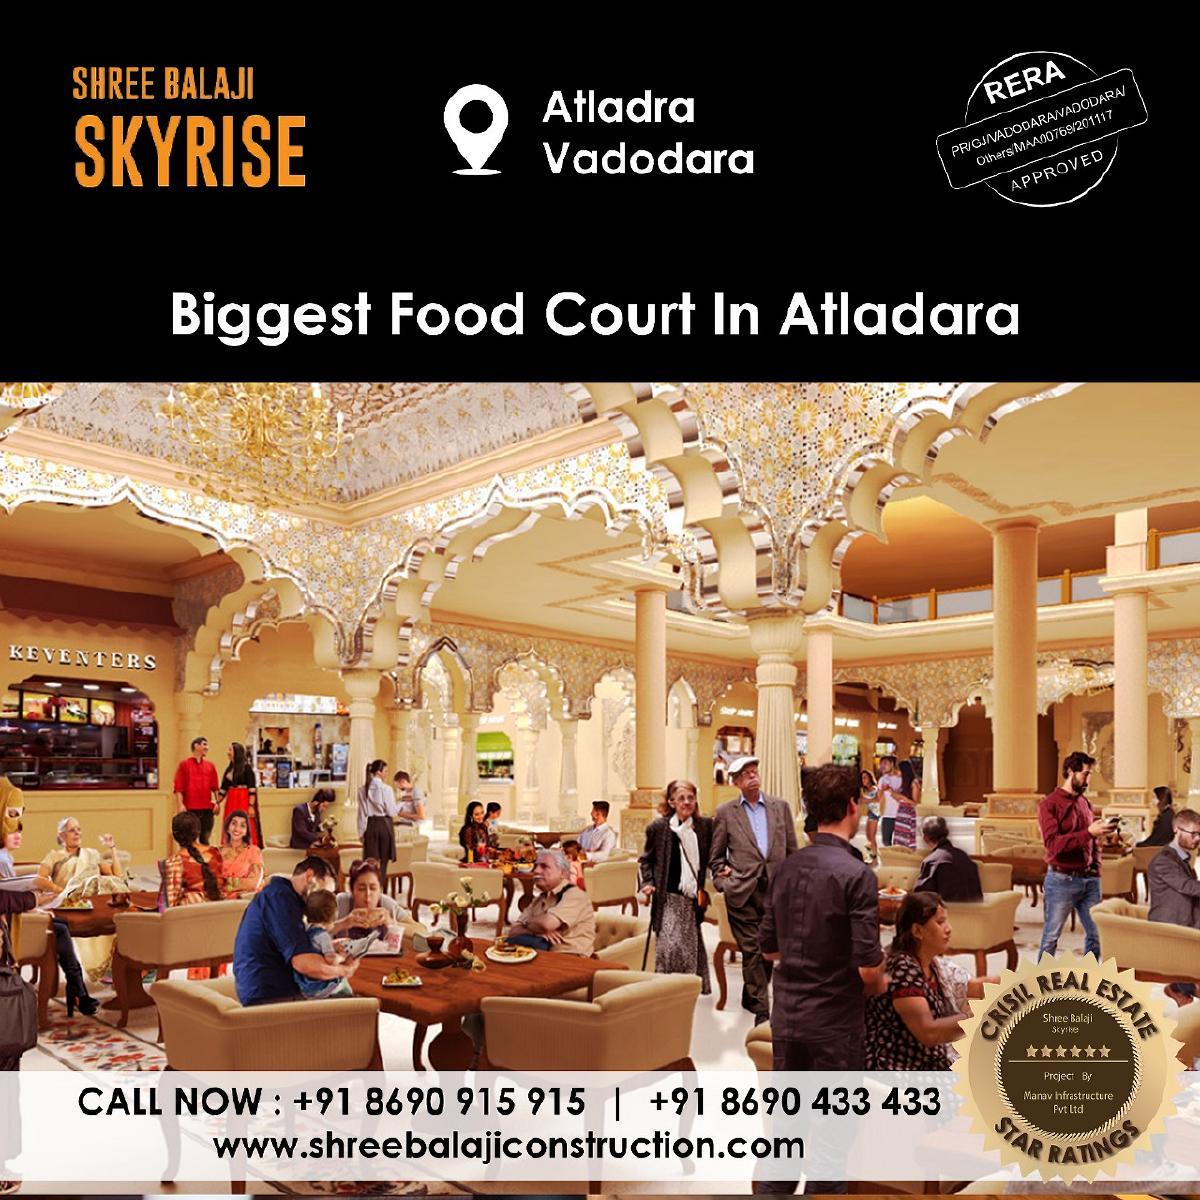 Take a break and grab a bite at Atladara's largest food